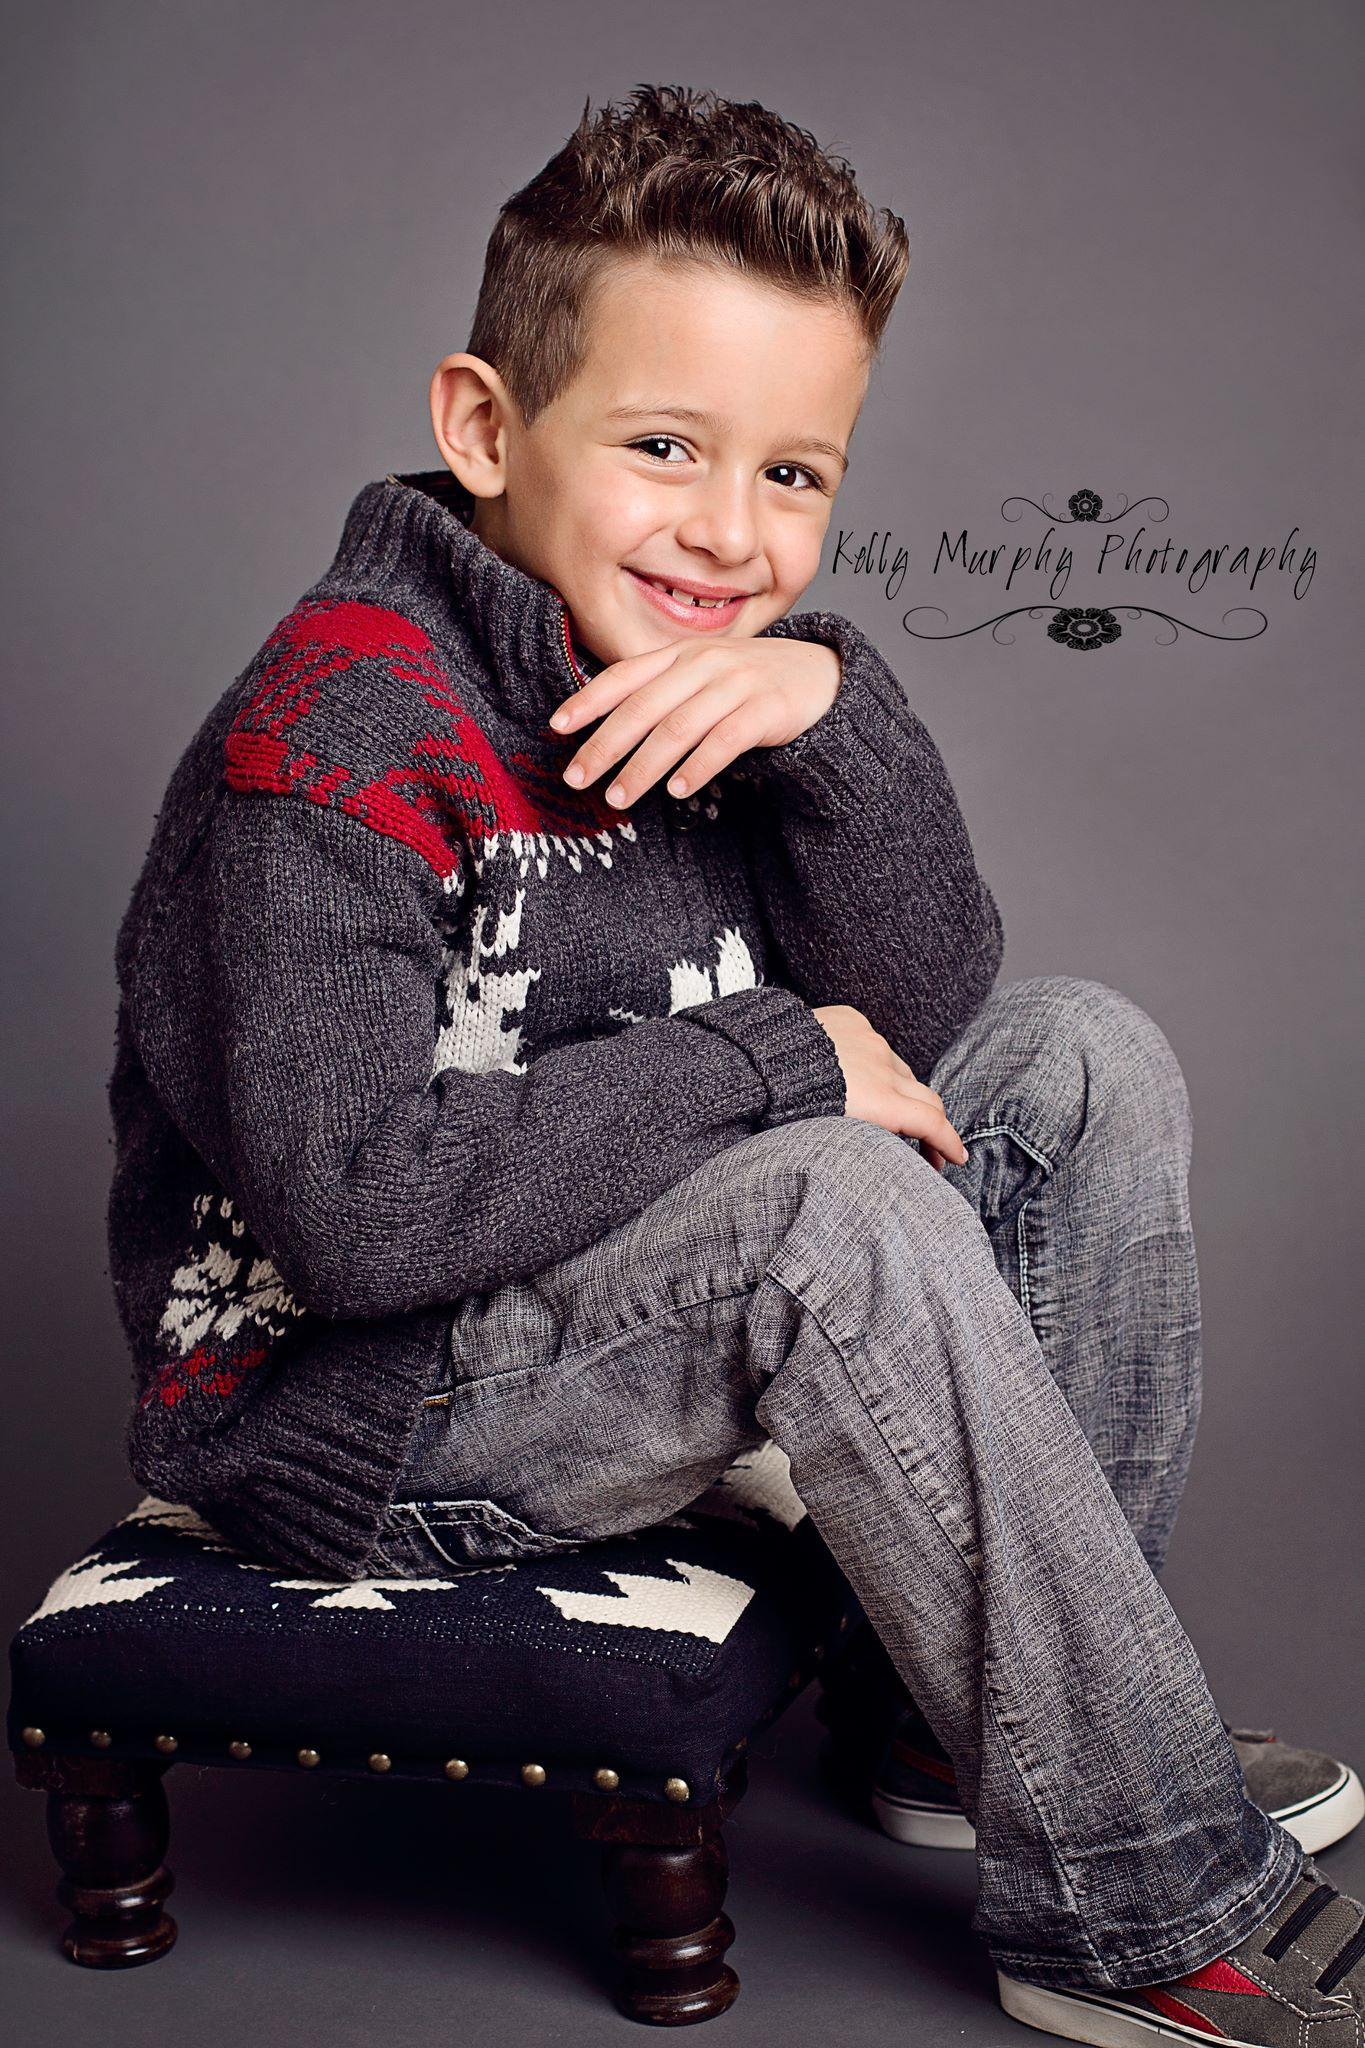 6 Year Old Boy Kelly Murphy Photography